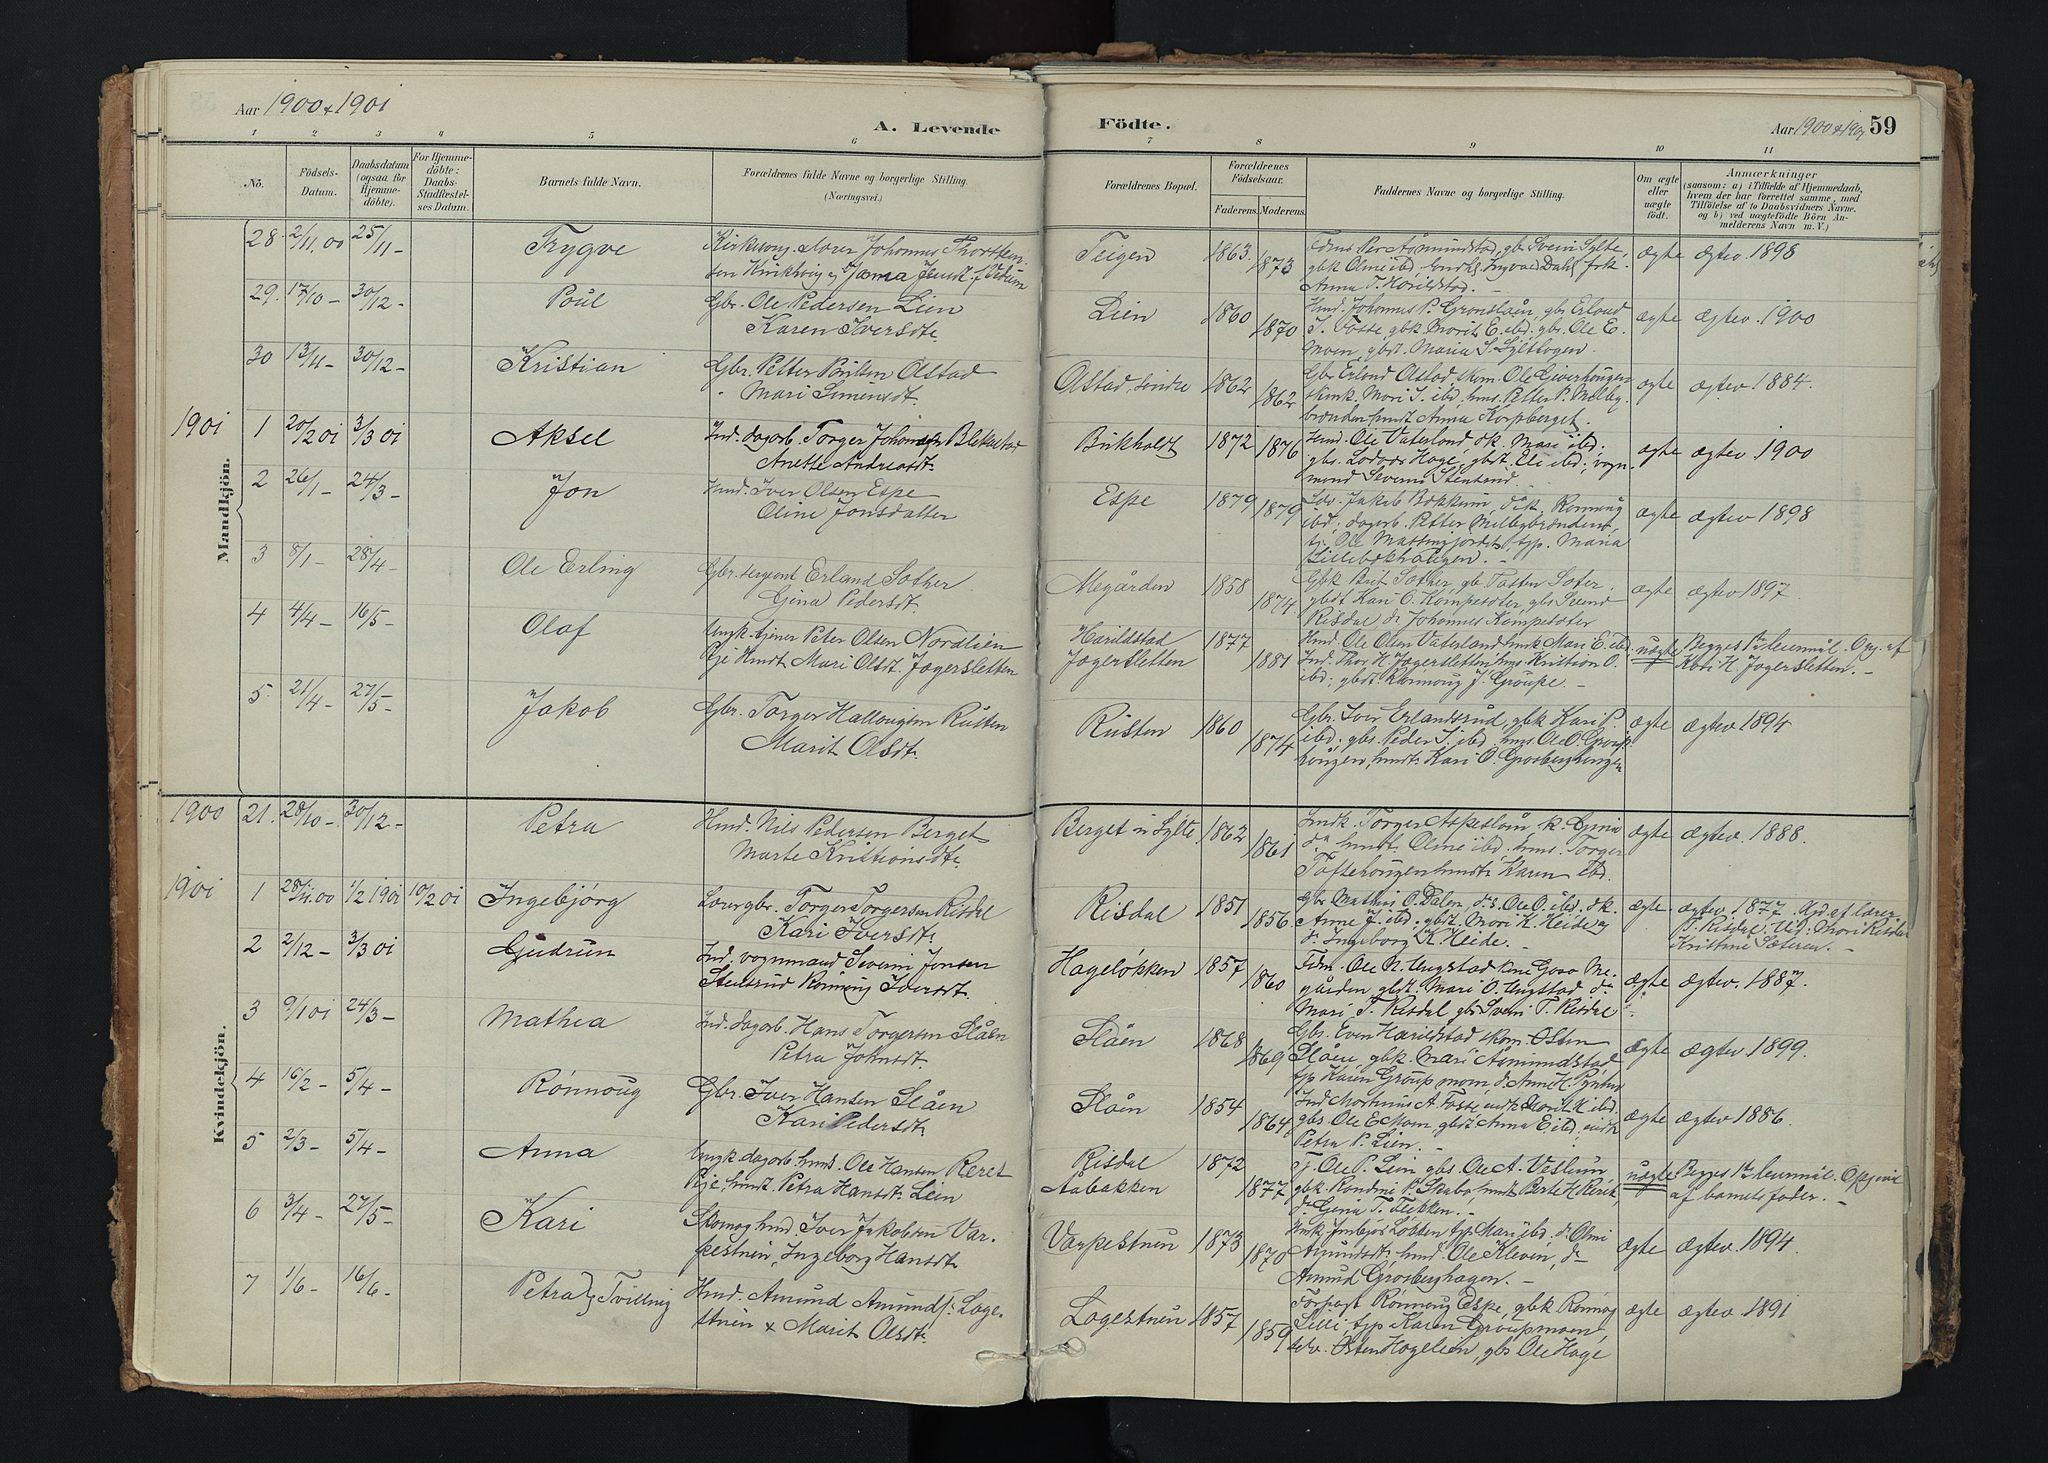 SAH, Nord-Fron prestekontor, Ministerialbok nr. 5, 1884-1914, s. 59